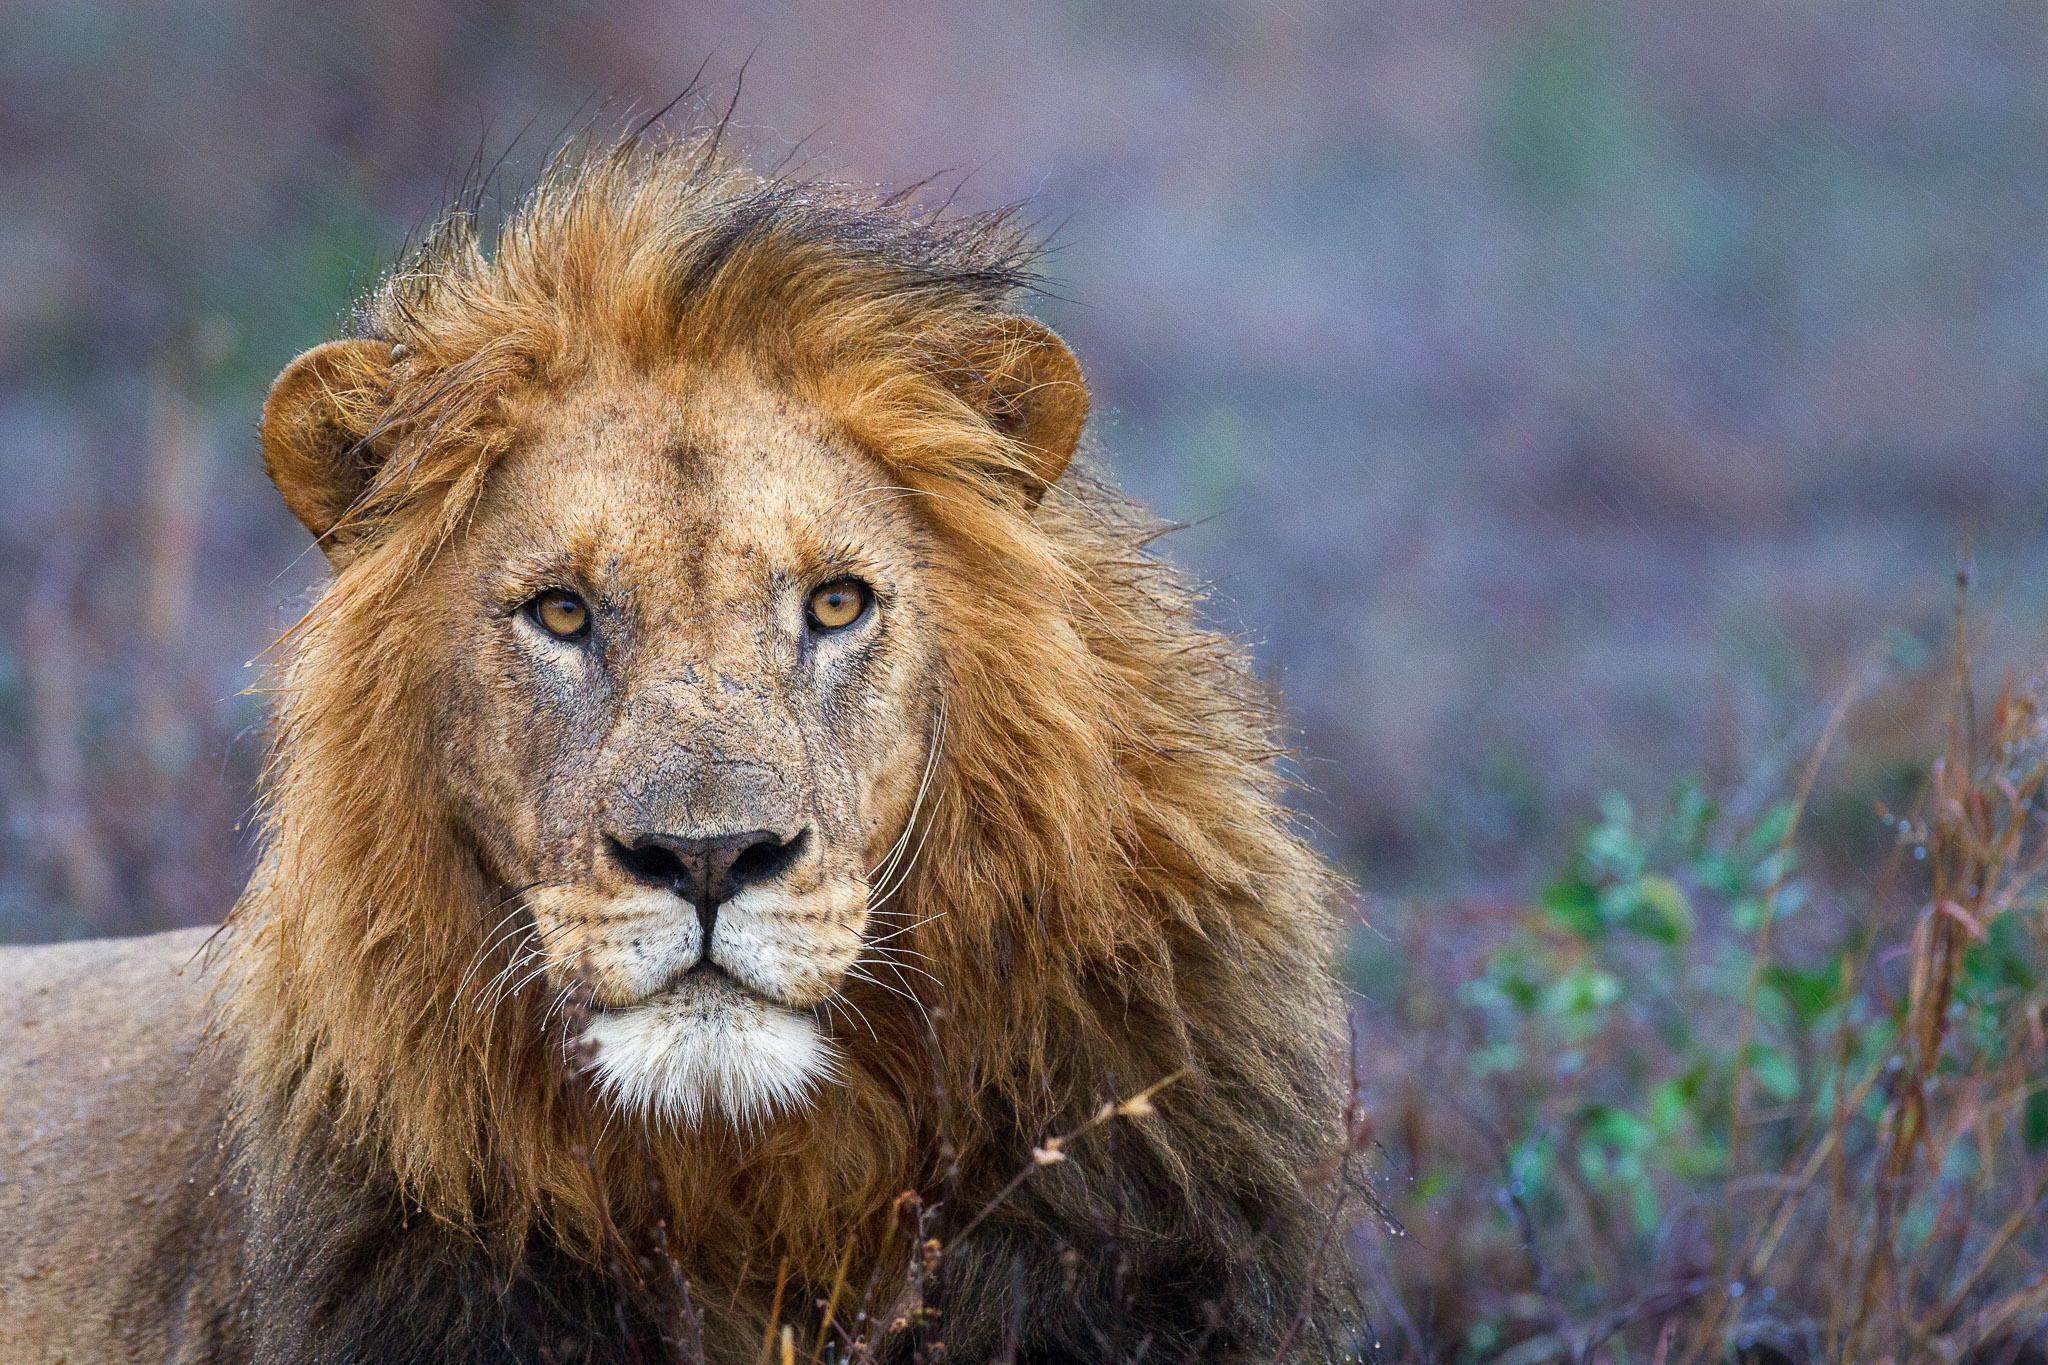 A male lion in the rain